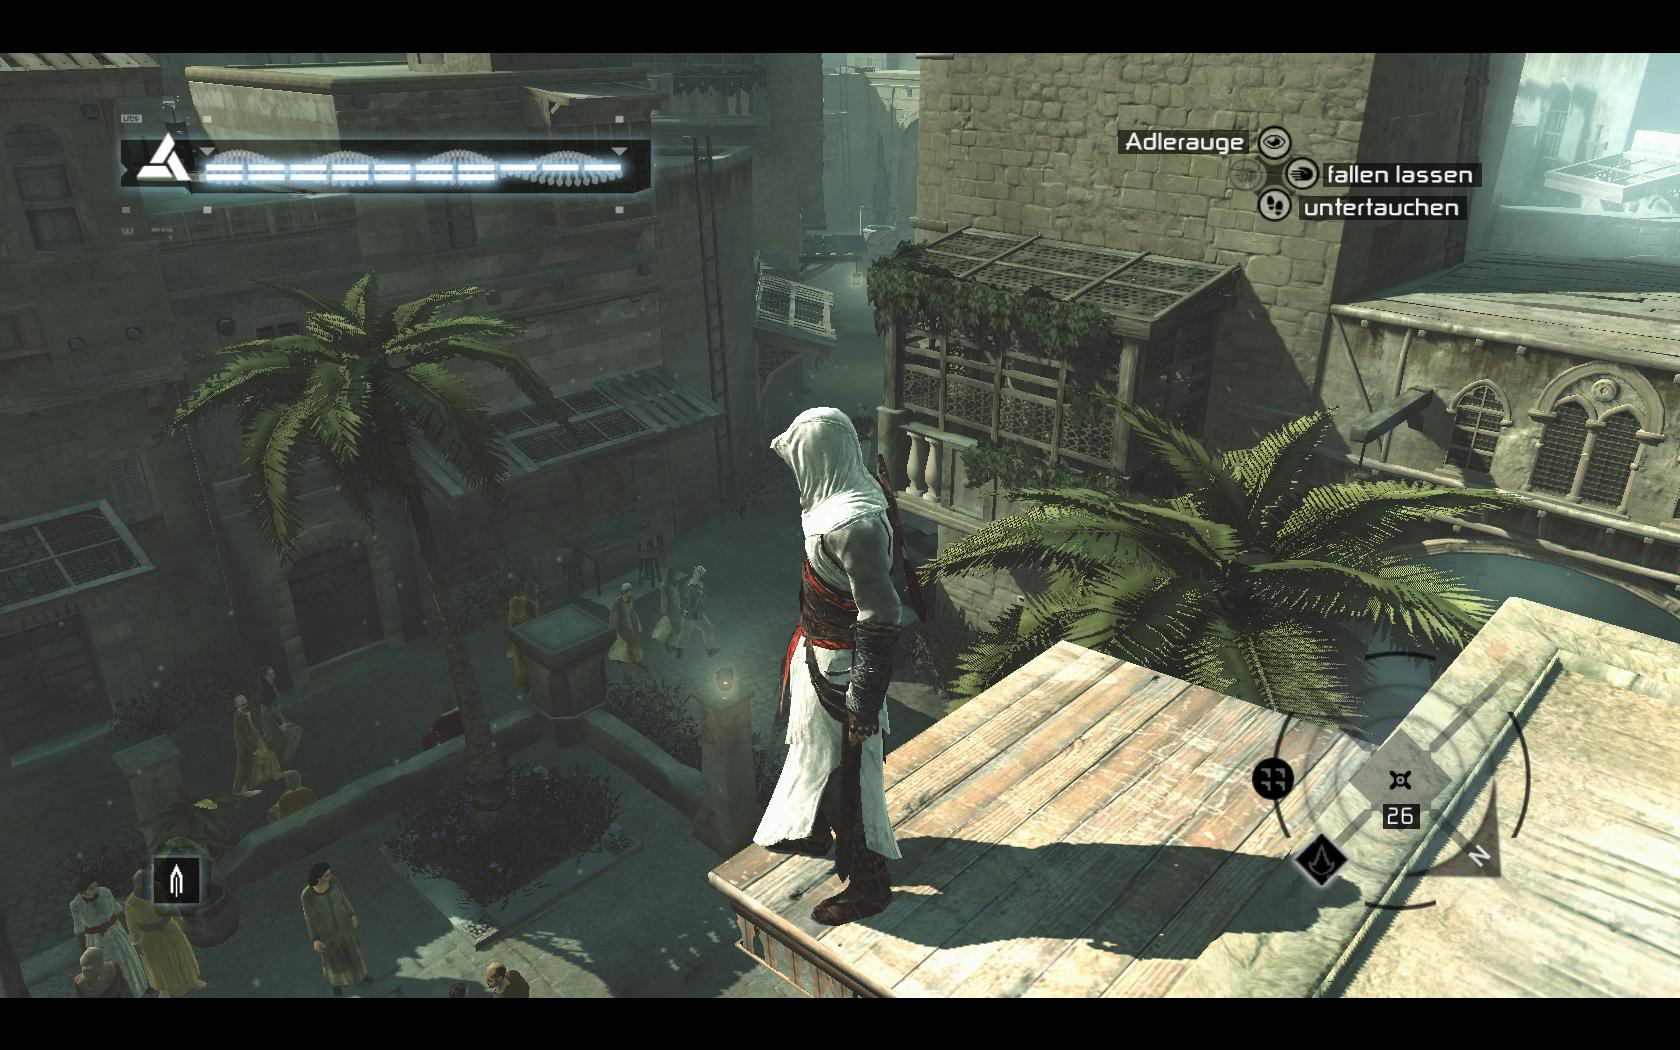 assassinscreed_dx10_2008_04_17_20_18_57_50